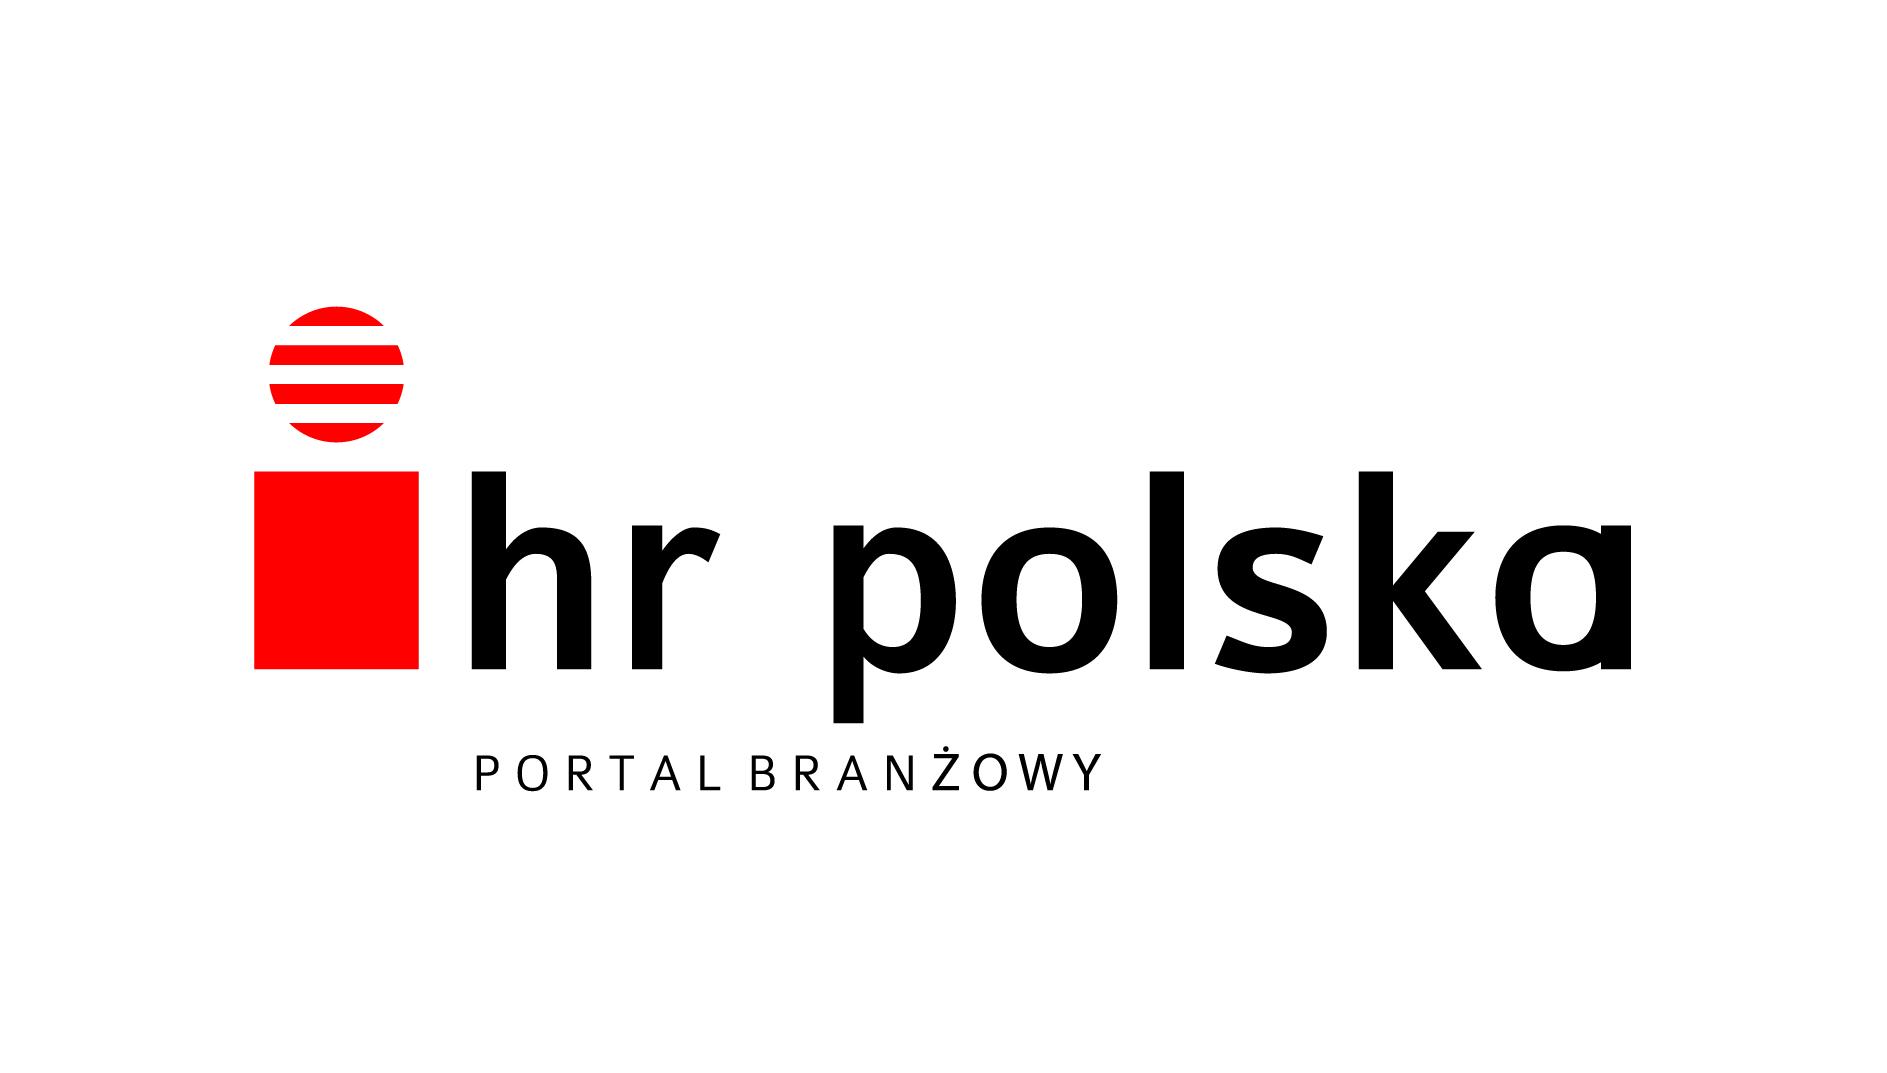 4 hr polska - portal branżowy